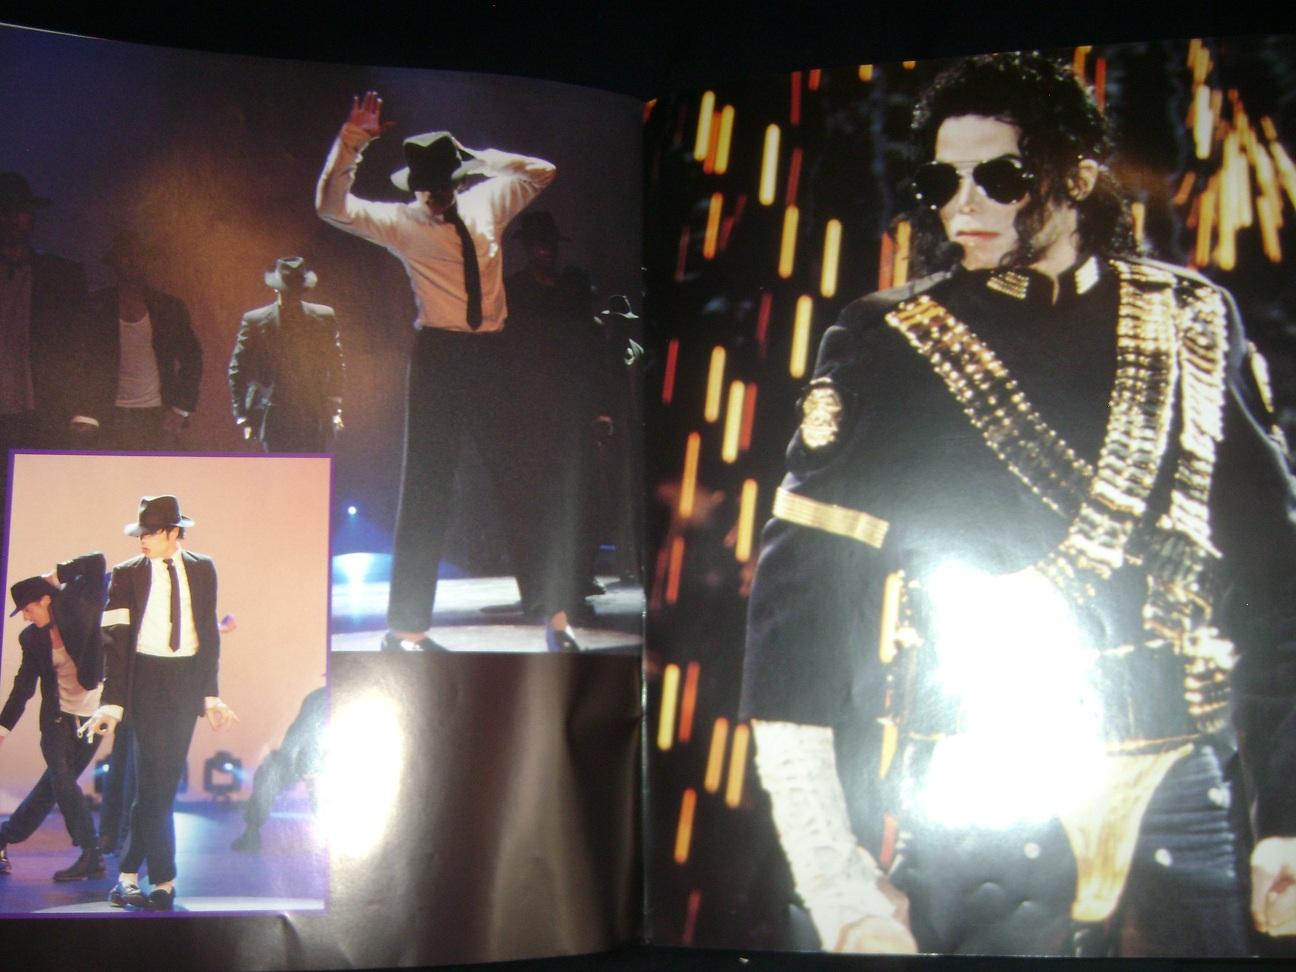 Michael_Jackson_King_of_pop_5.JPG